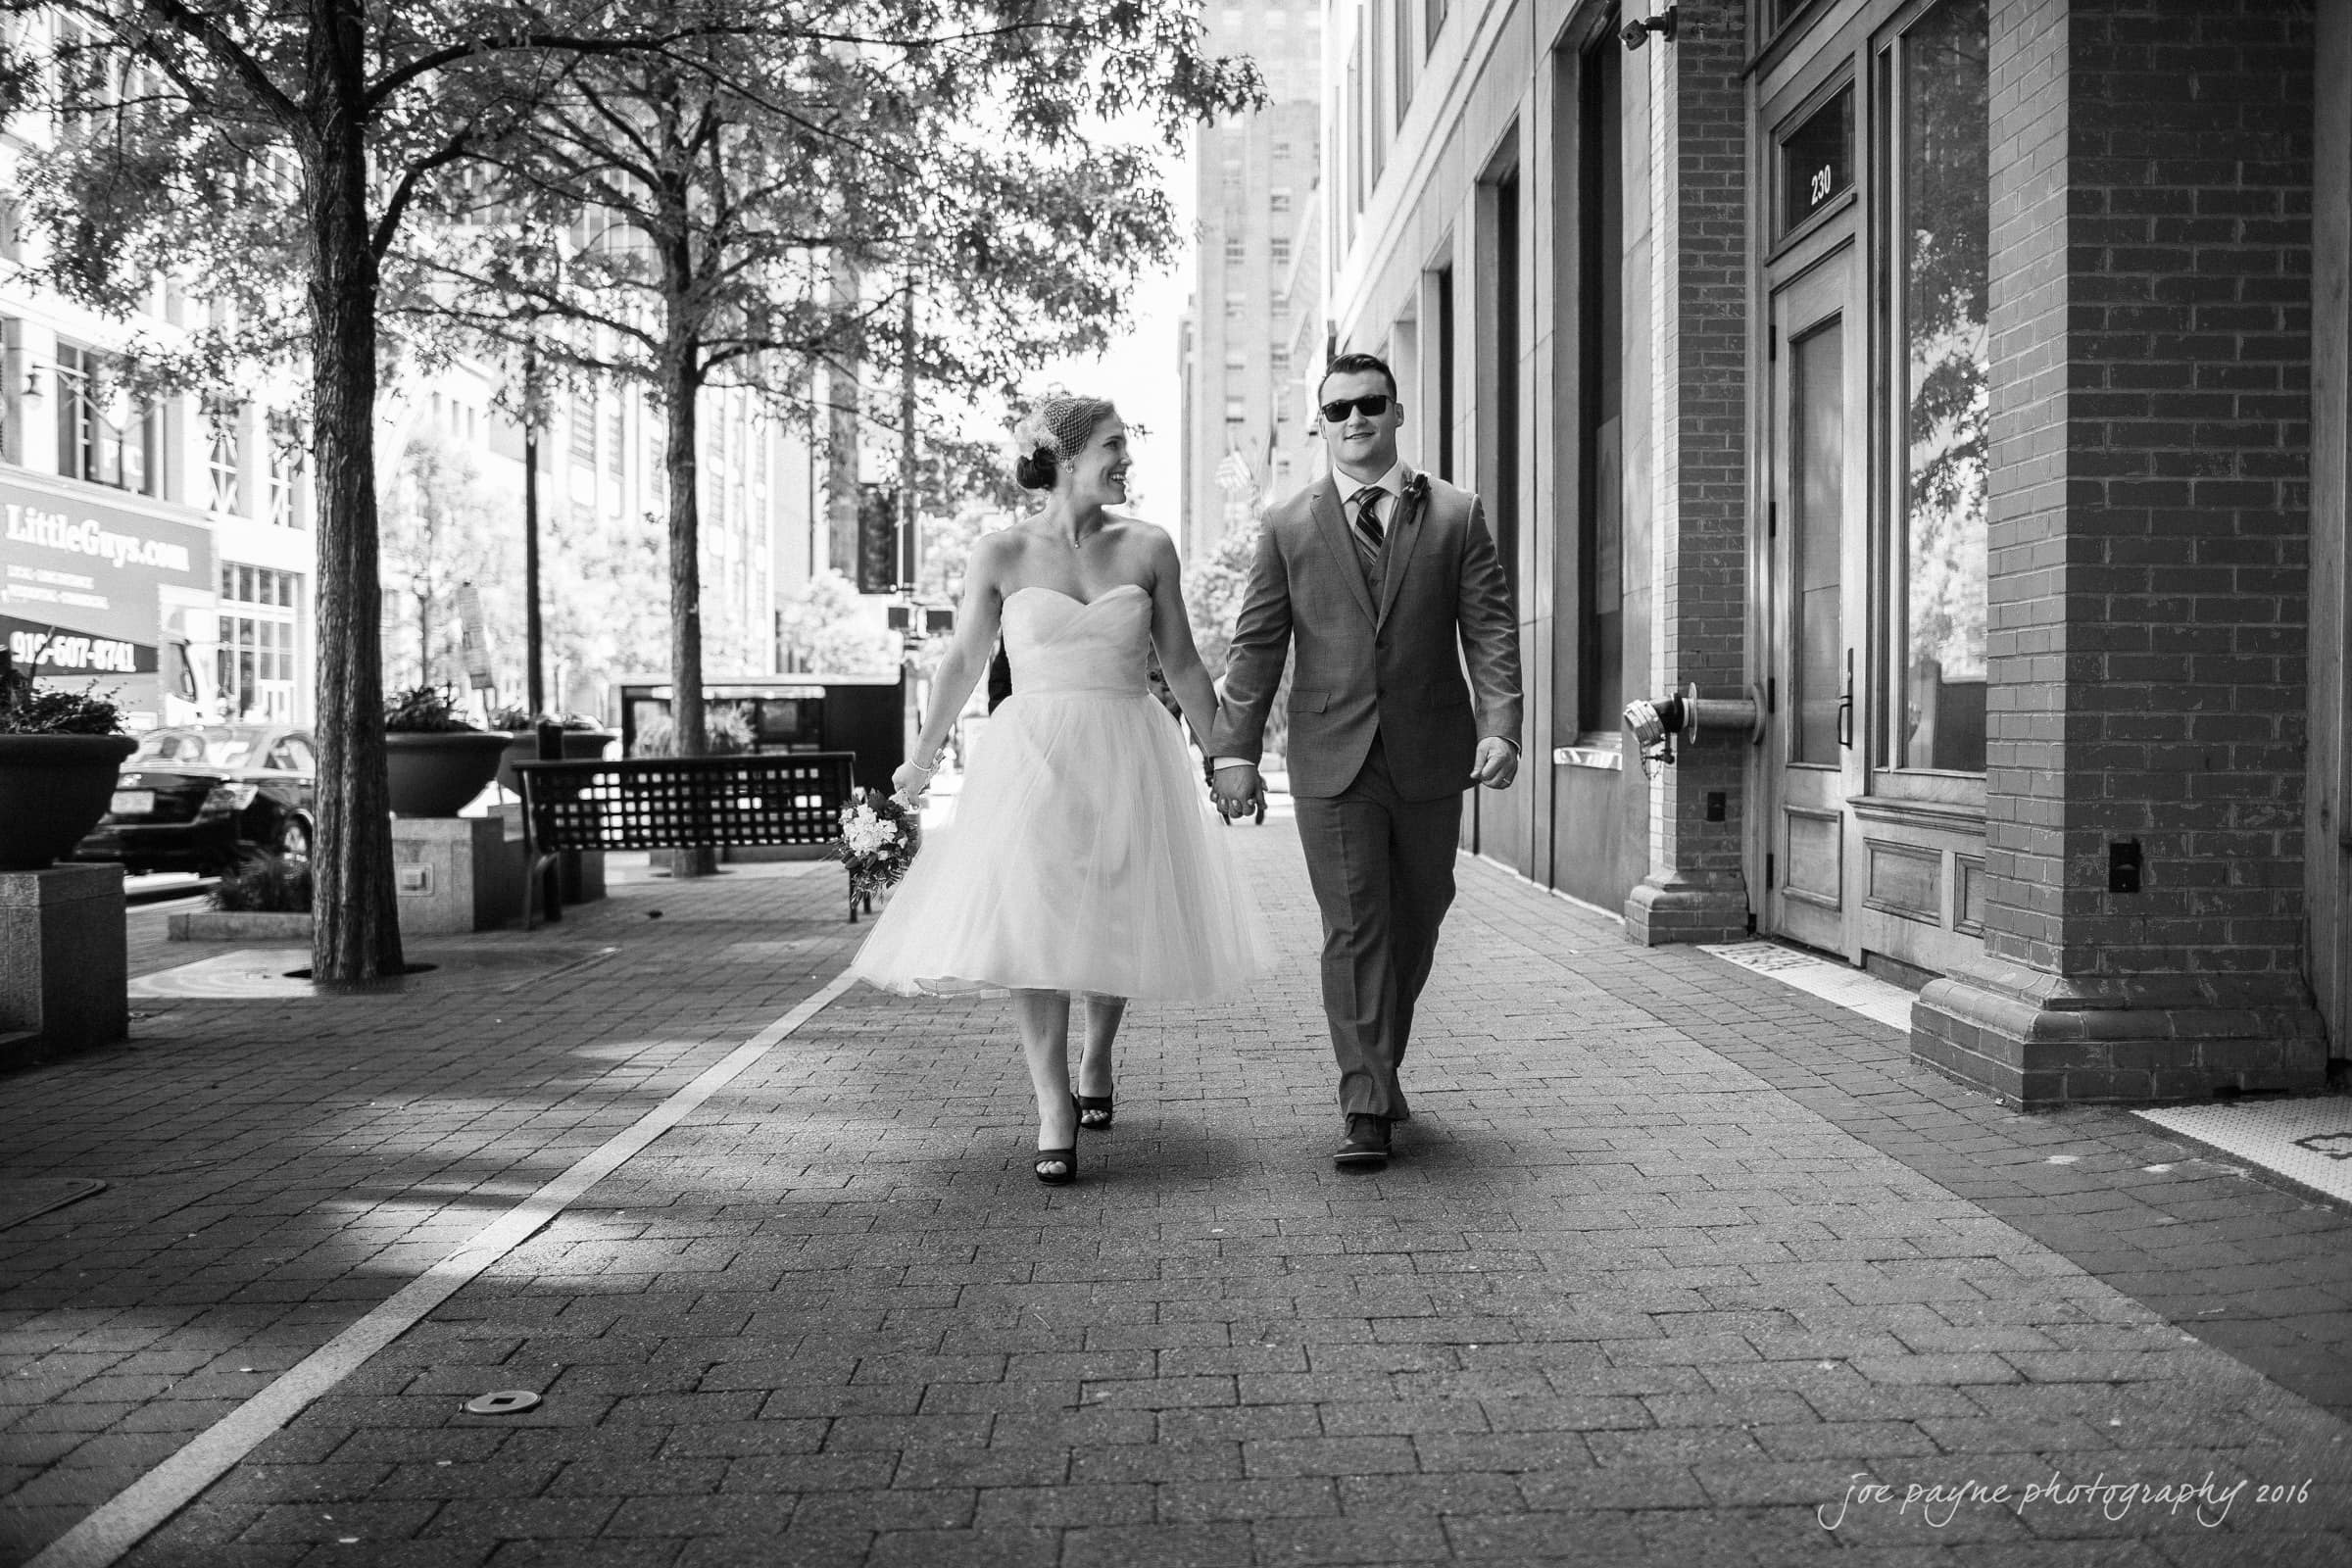 Downtown Raleigh Wedding Photographer - Alexandra & Trent -14